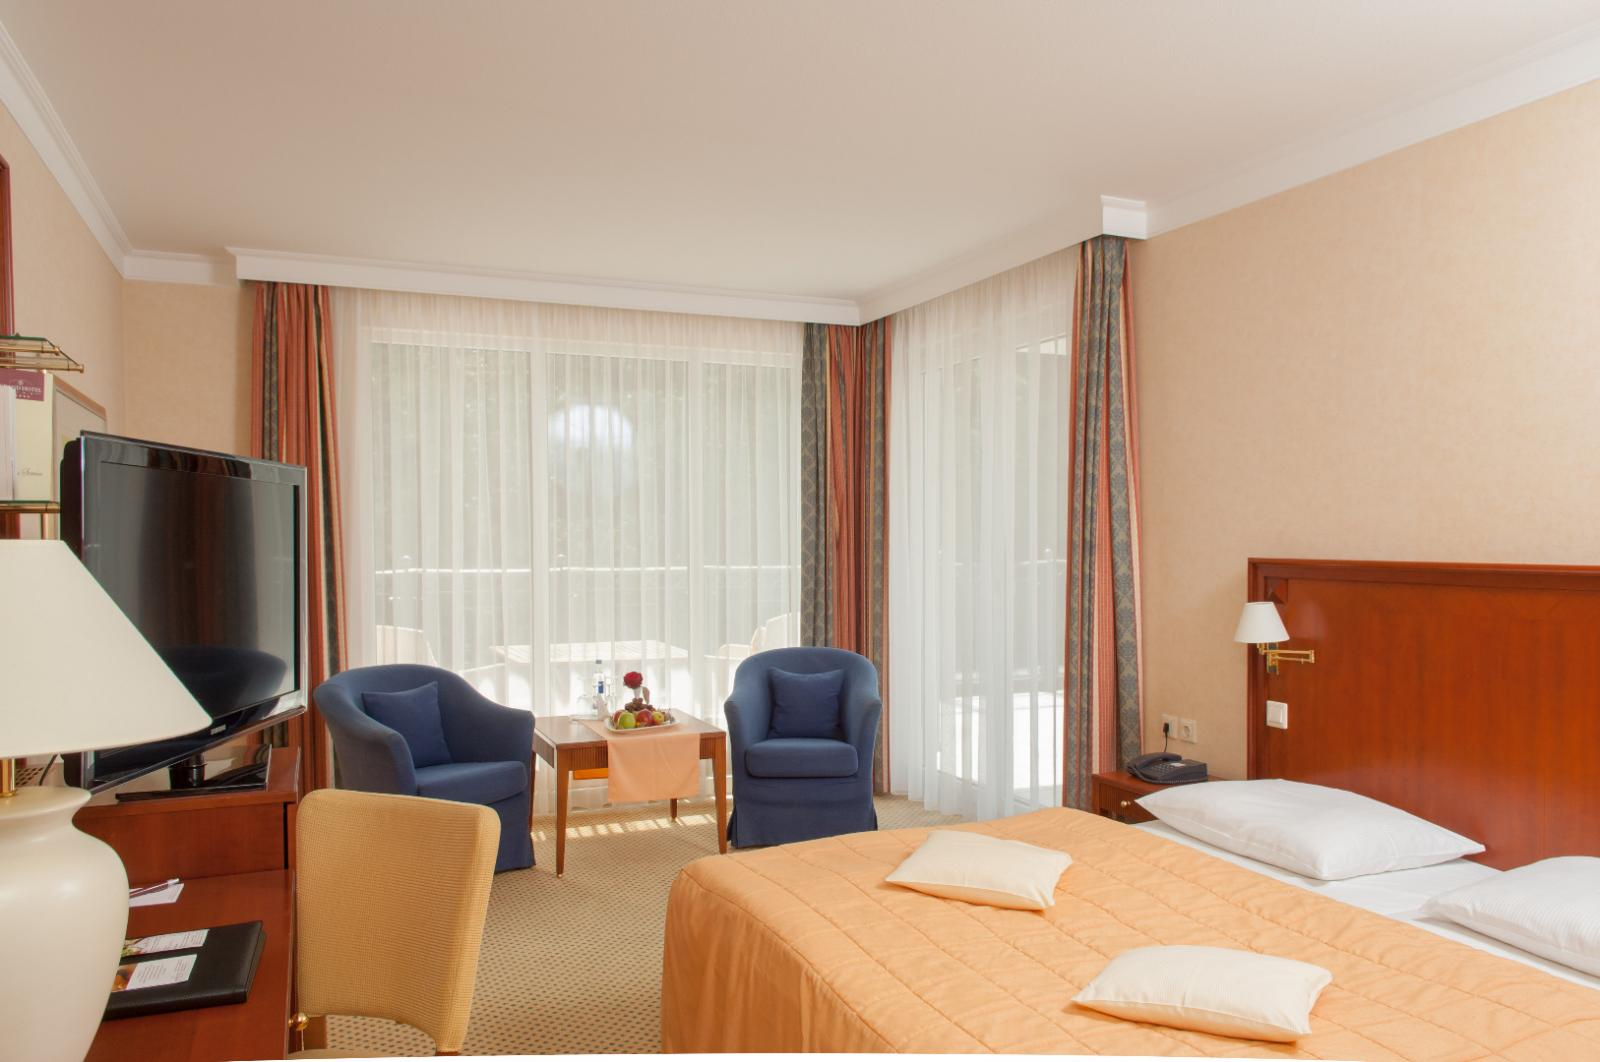 Puria Hotel Binz Sterne